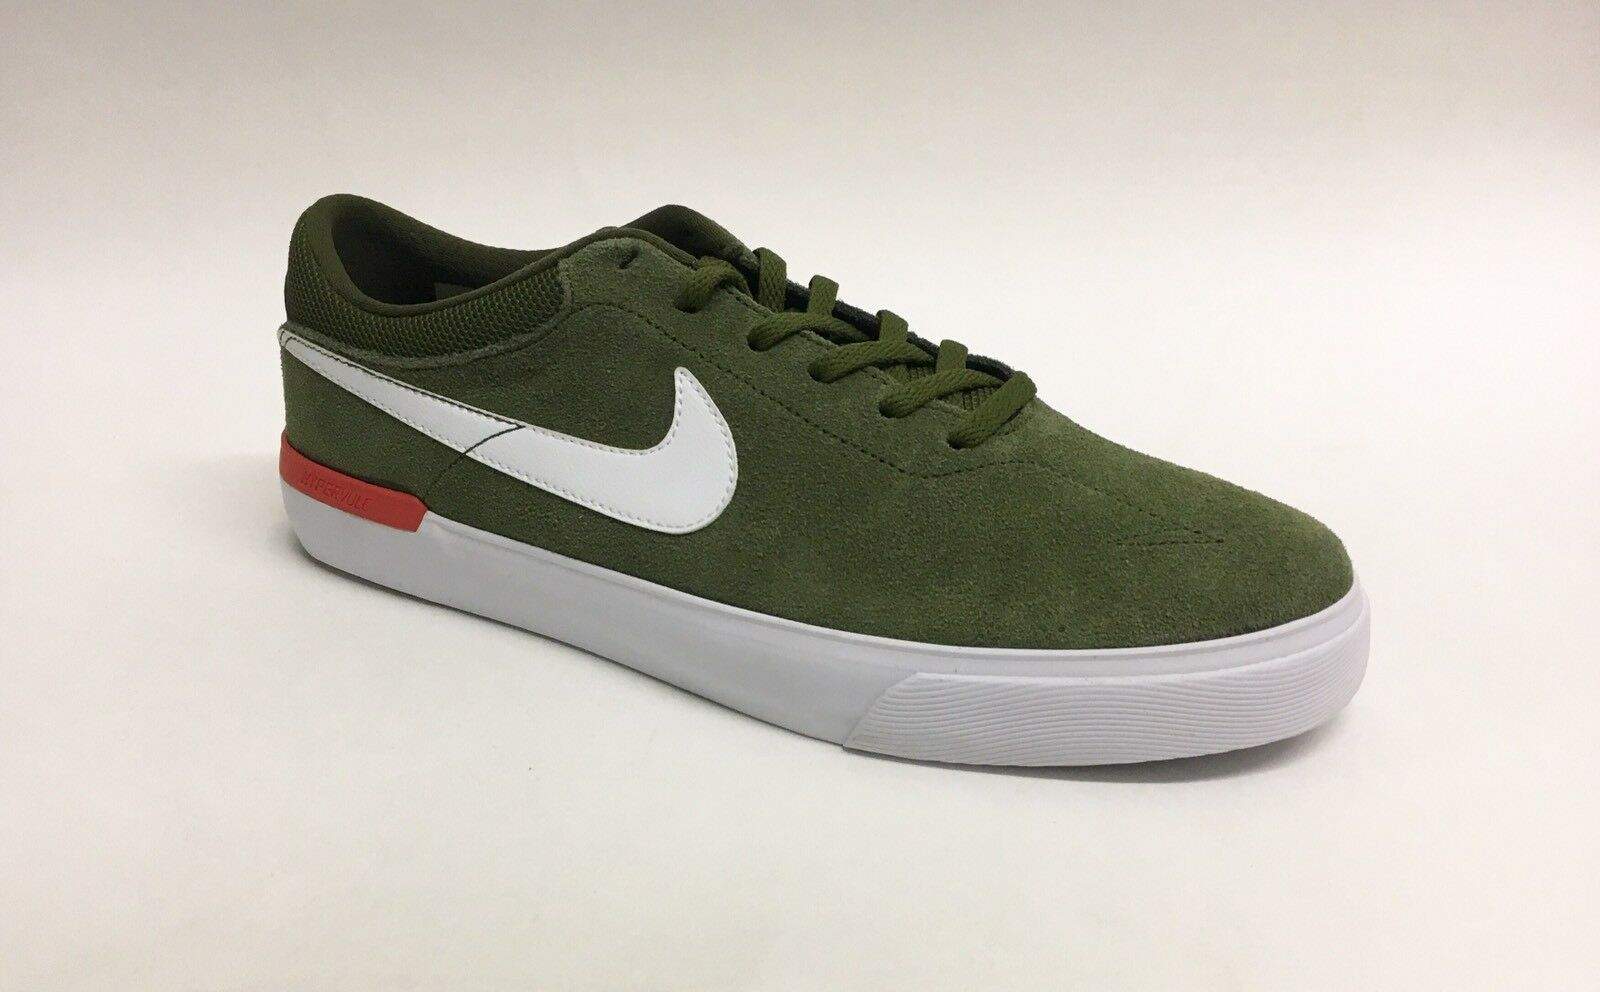 Nike uomini sb sb sb koston hypervulc verde / orange skateboard 844447-318 Uomo numero 9 6b812f